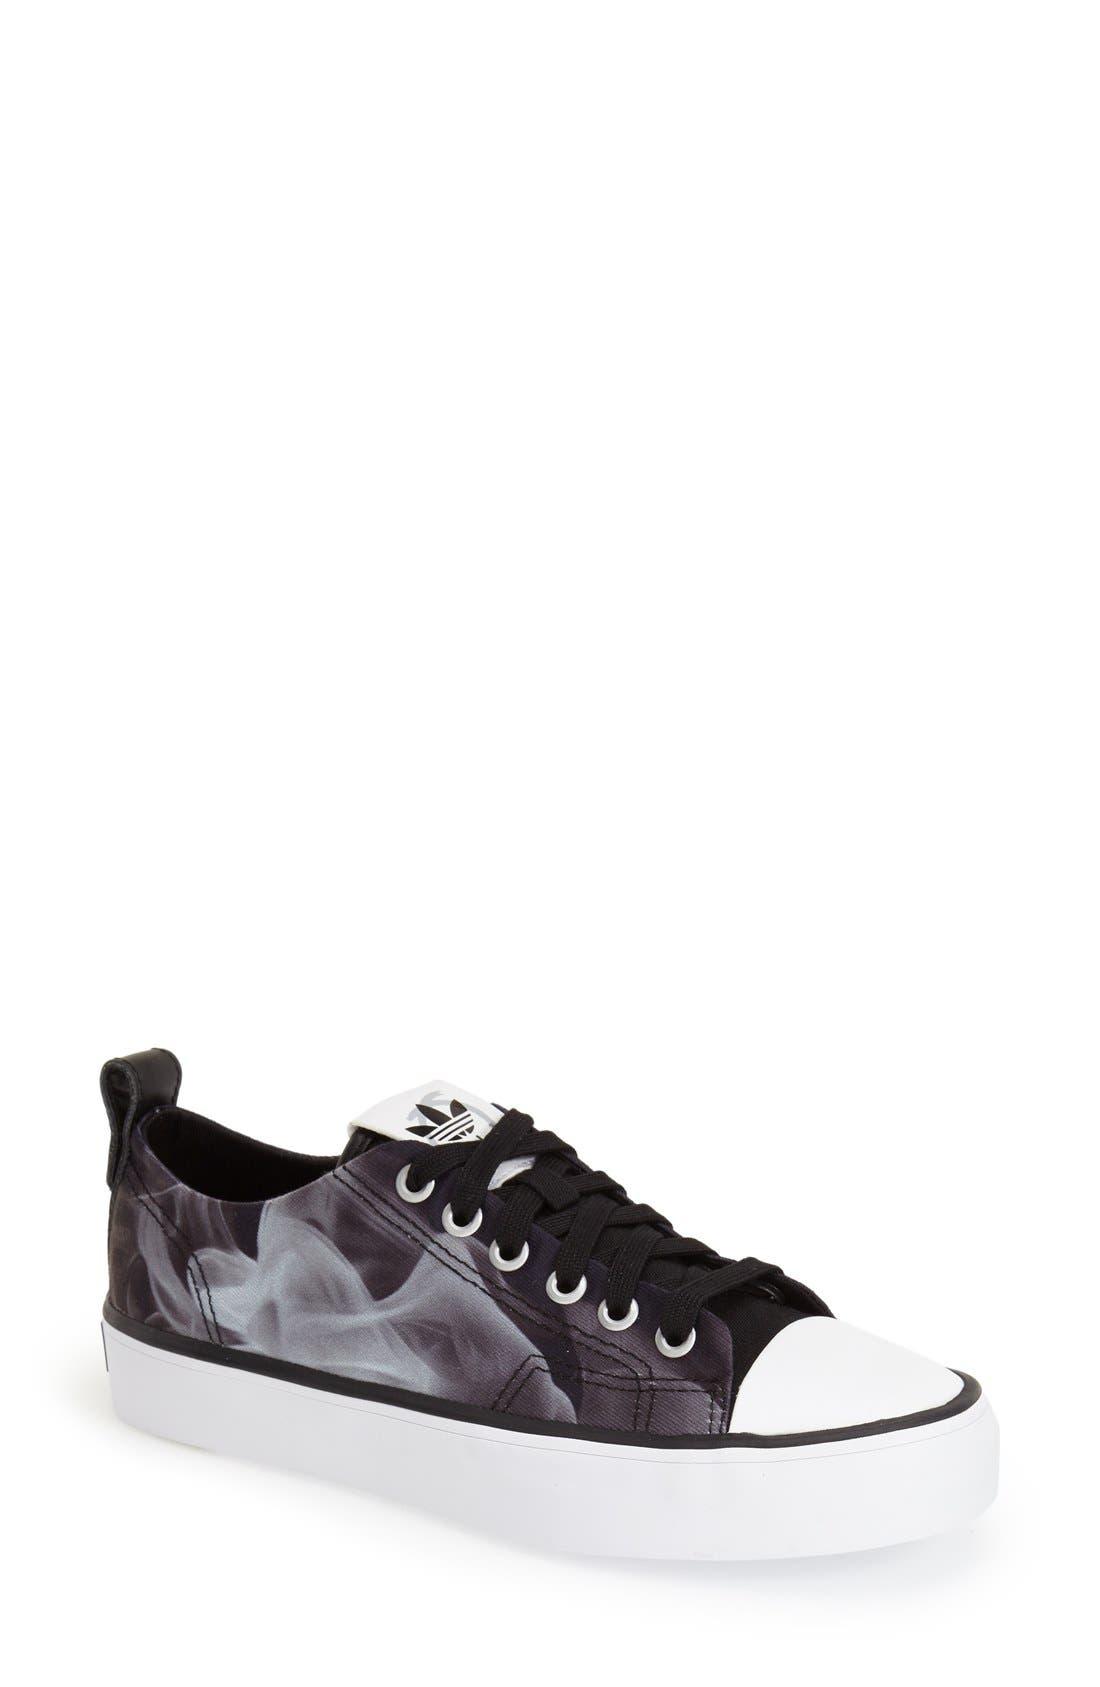 Alternate Image 1 Selected - adidas 'Honey 2.0 - Rita Ora' Sneaker (Women)